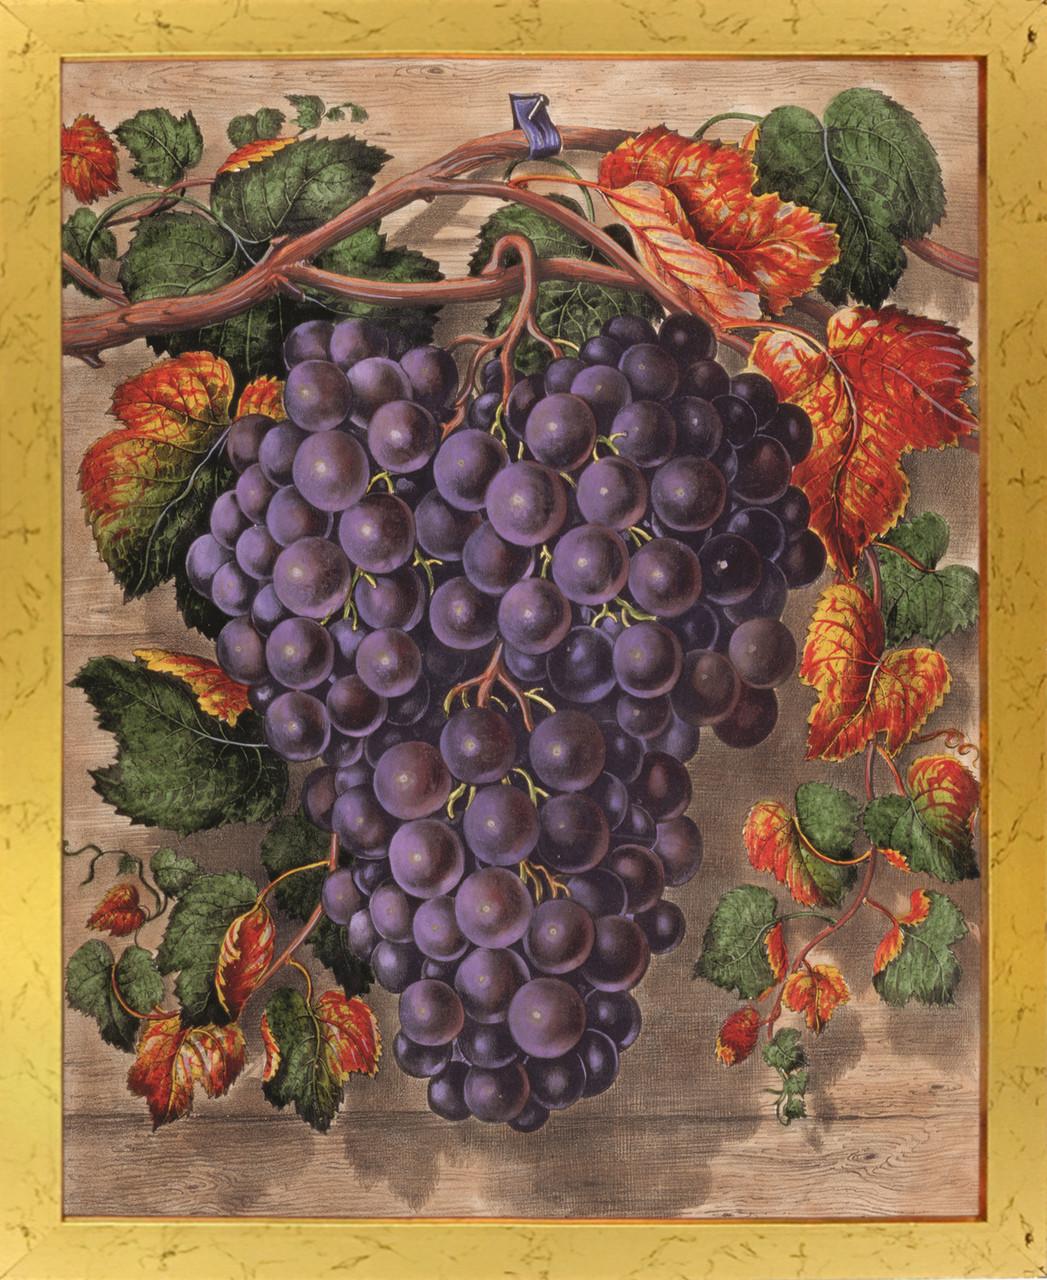 Black Grape Still Life Fruit Kitchen Wall Decor Art Print Golden Framed Poster 18x24 Impact Posters Gallery